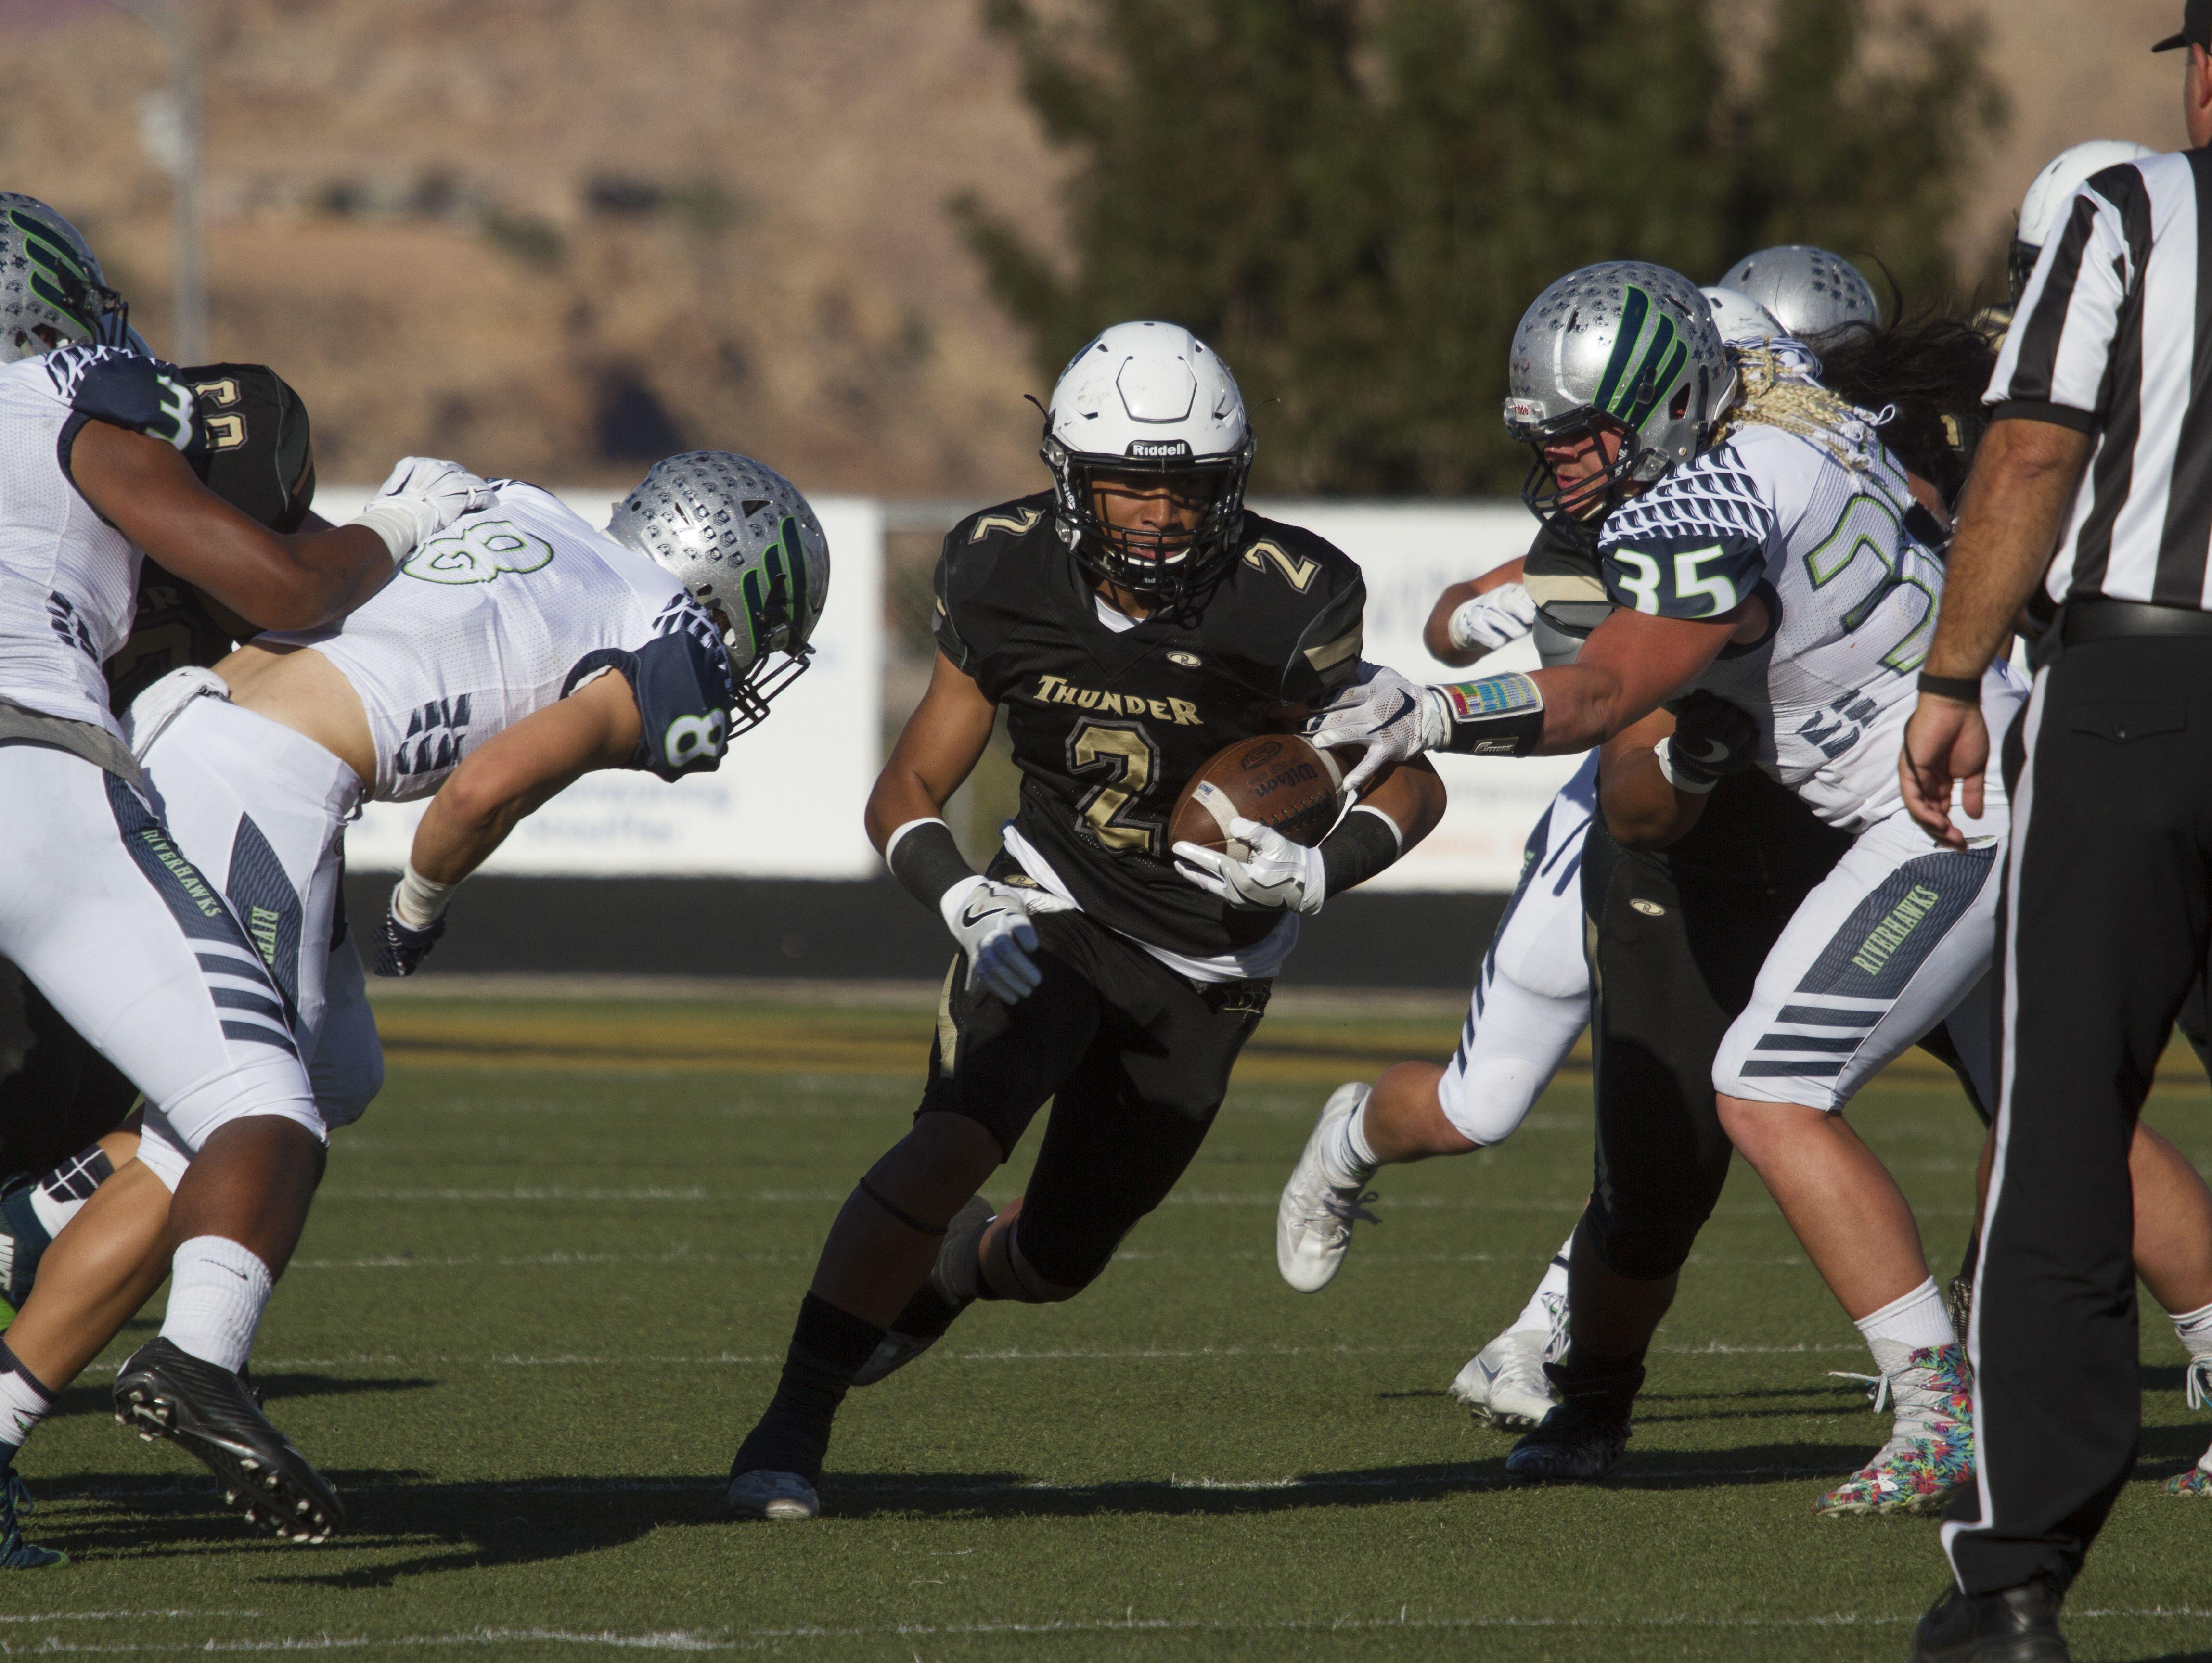 Desert Hills football defeats Ridgeline 49-24 in quarterfinals Friday, Nov. 4, 2016.